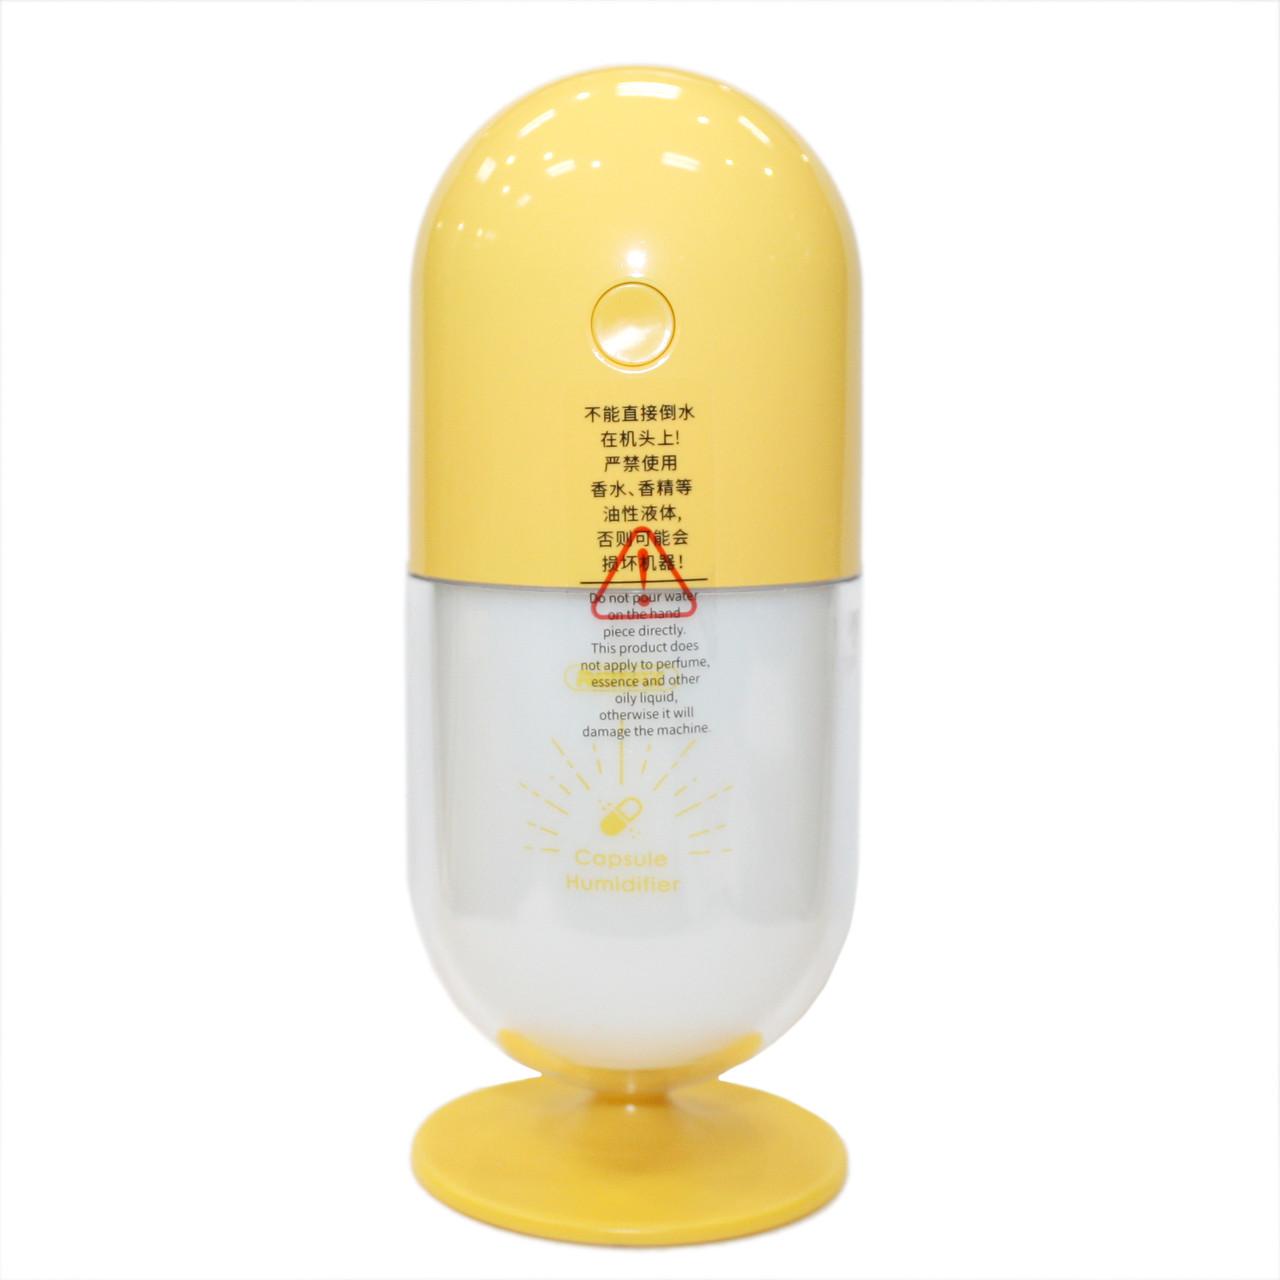 Увлажнитель воздуха Remax Capsule Mini Humidifier RT-A500 Yellow